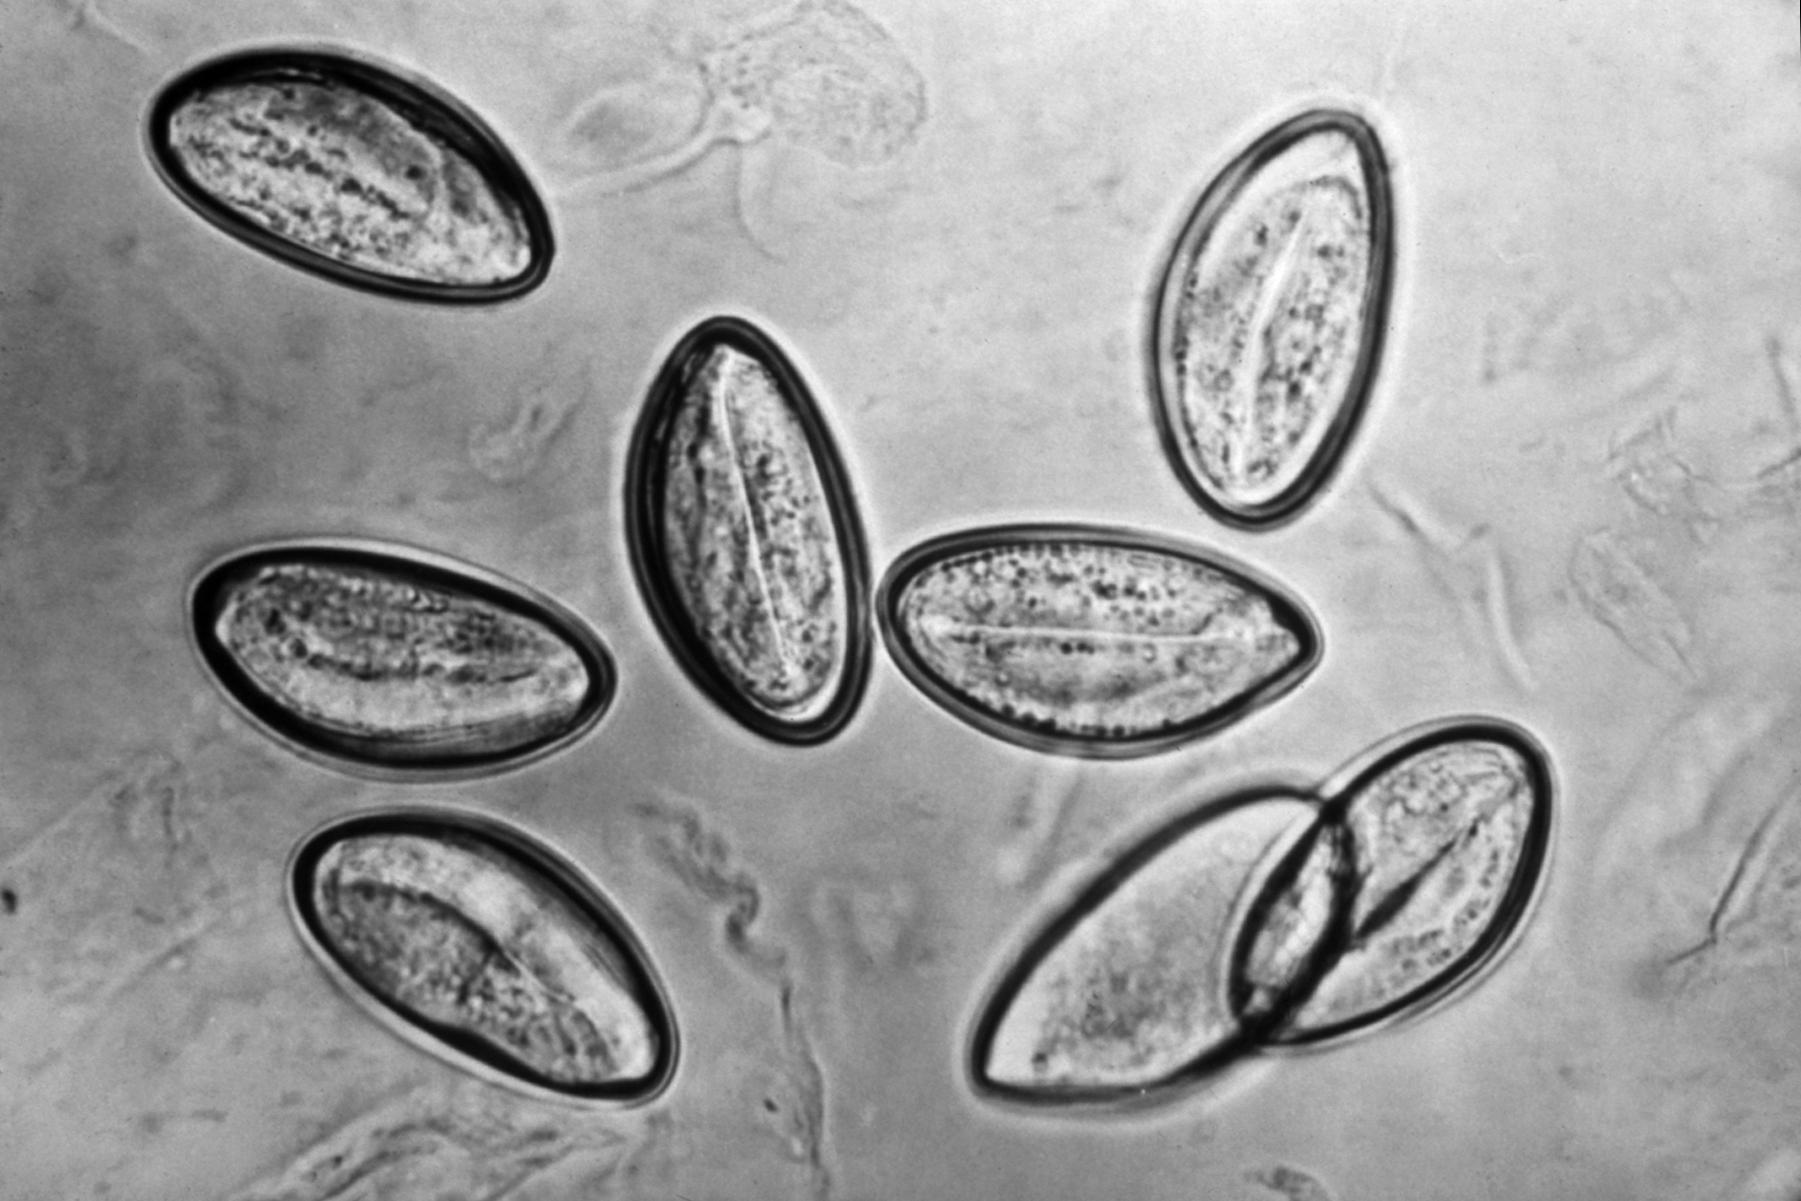 enterobius vermicularis location in the body huevos de oxiuros vermicularis